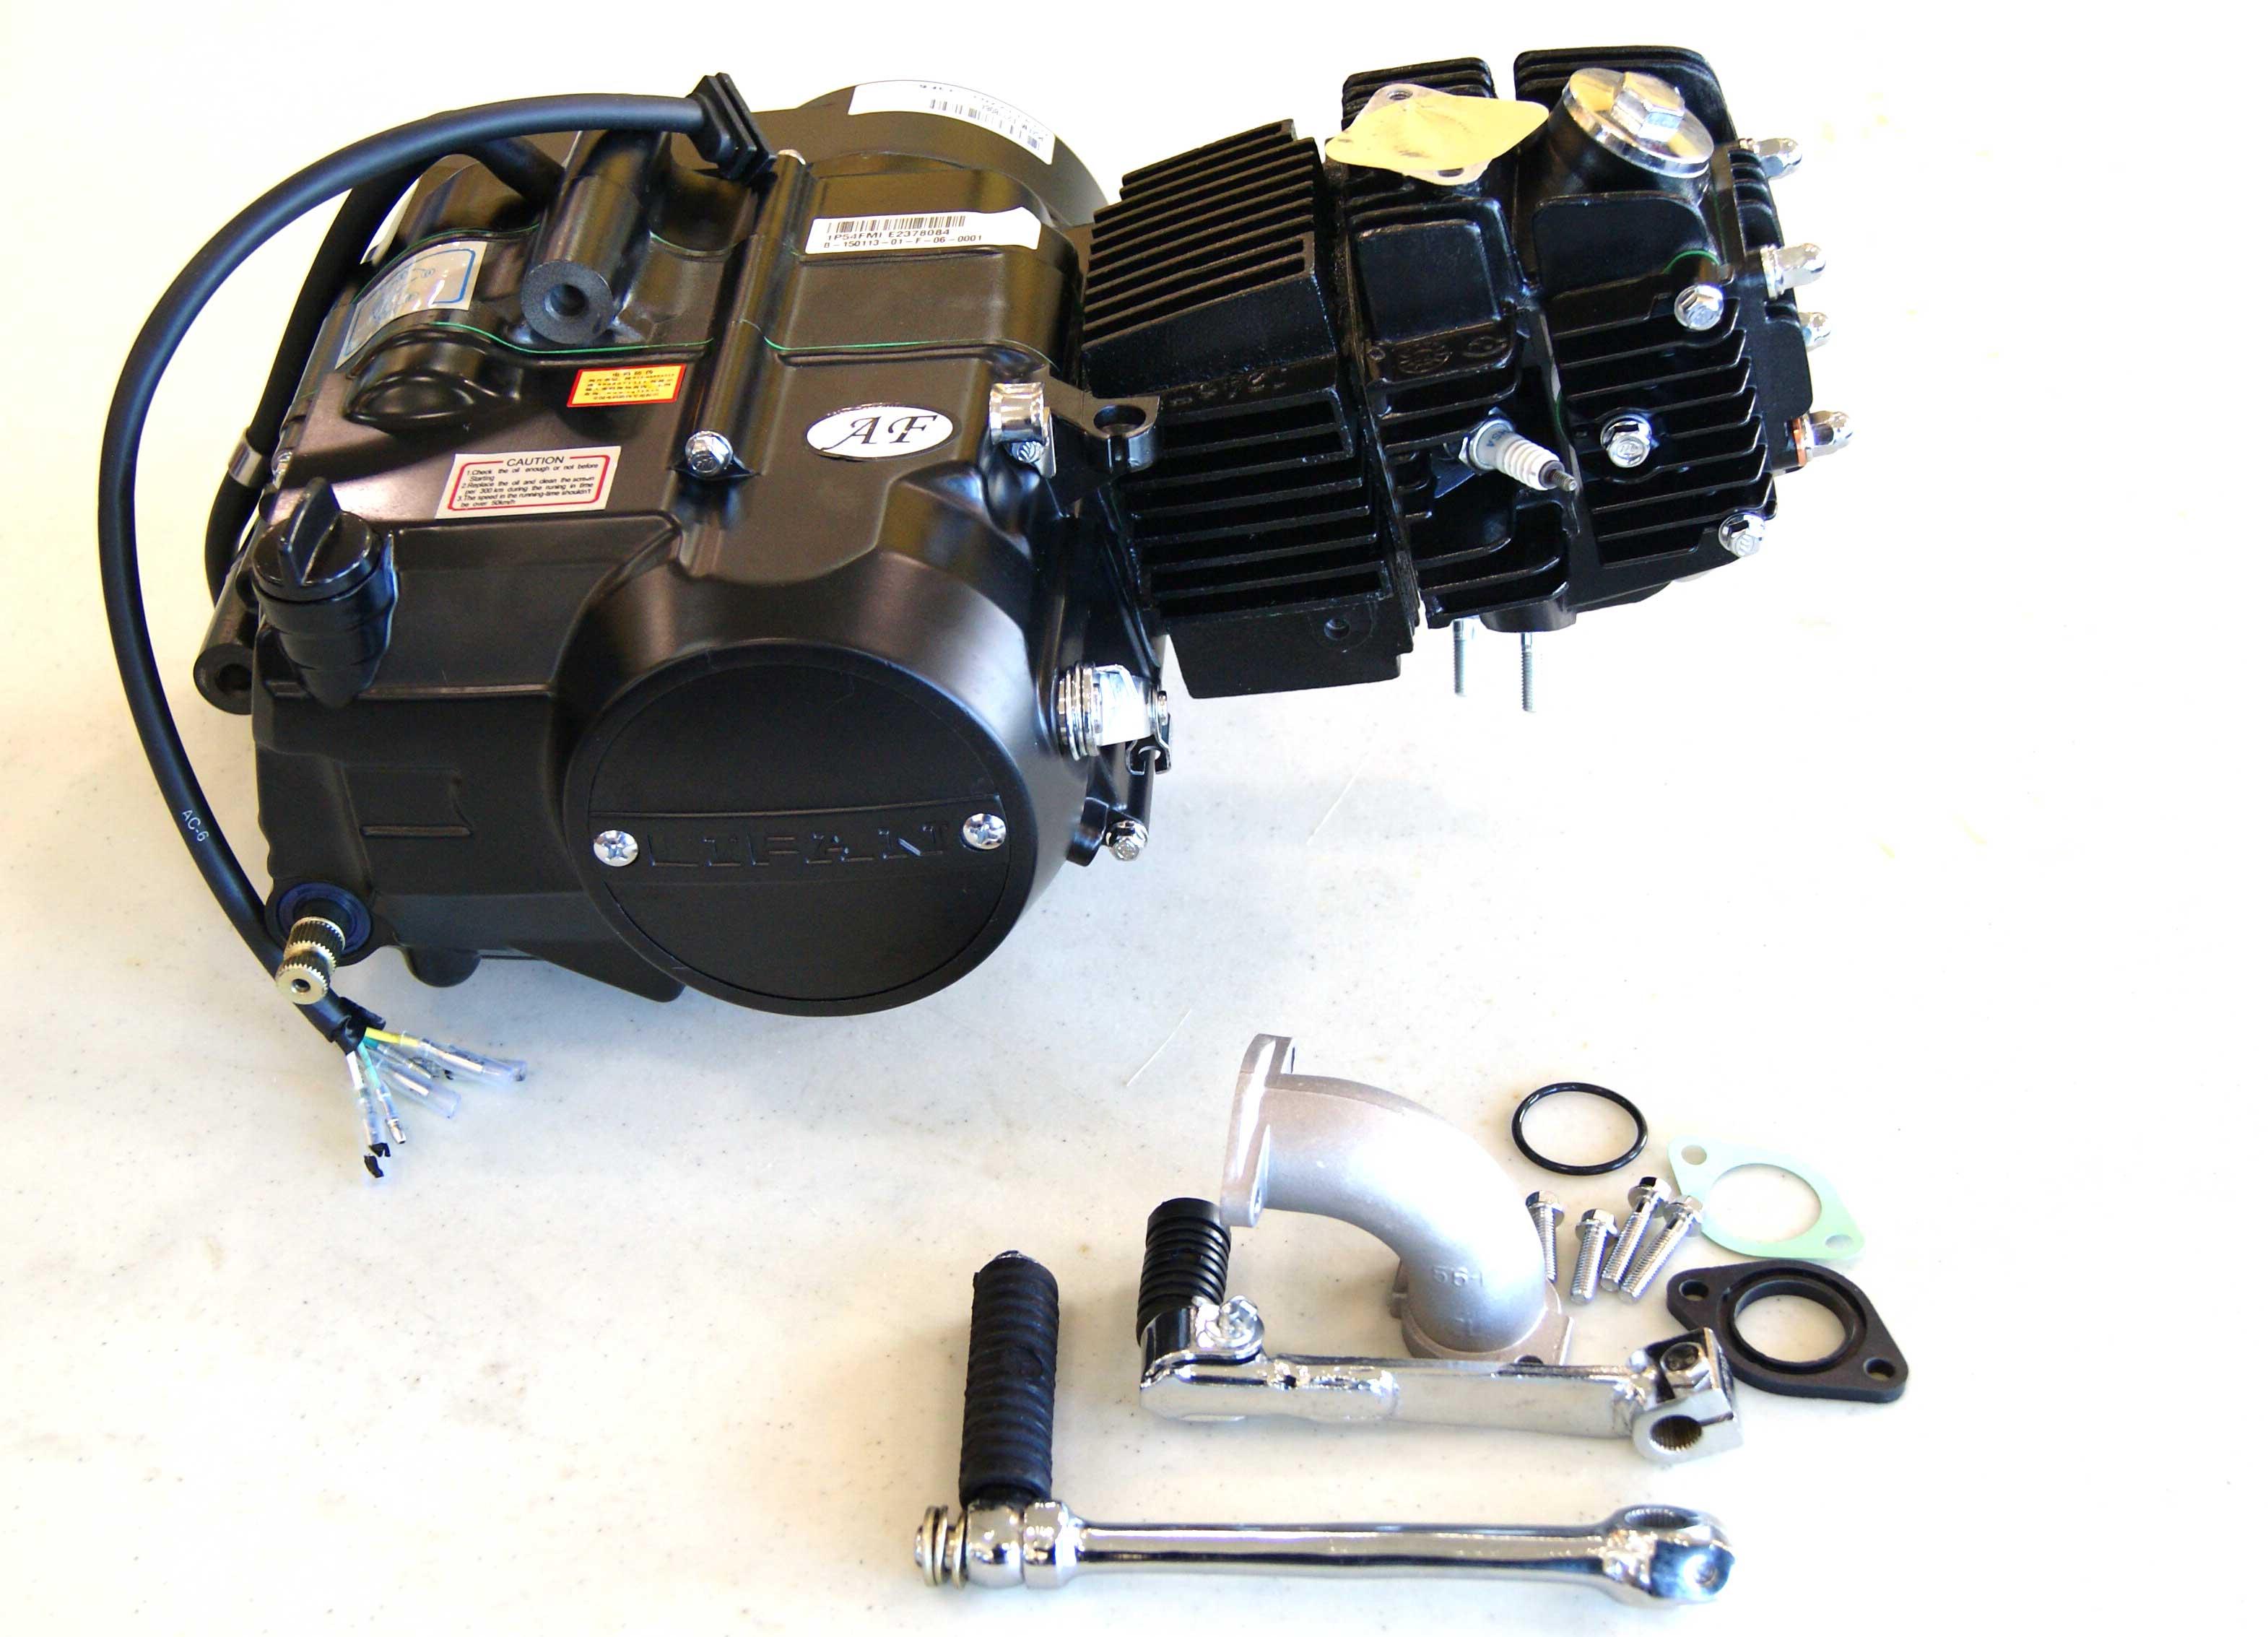 125cc lifan manual engine. Black Bedroom Furniture Sets. Home Design Ideas